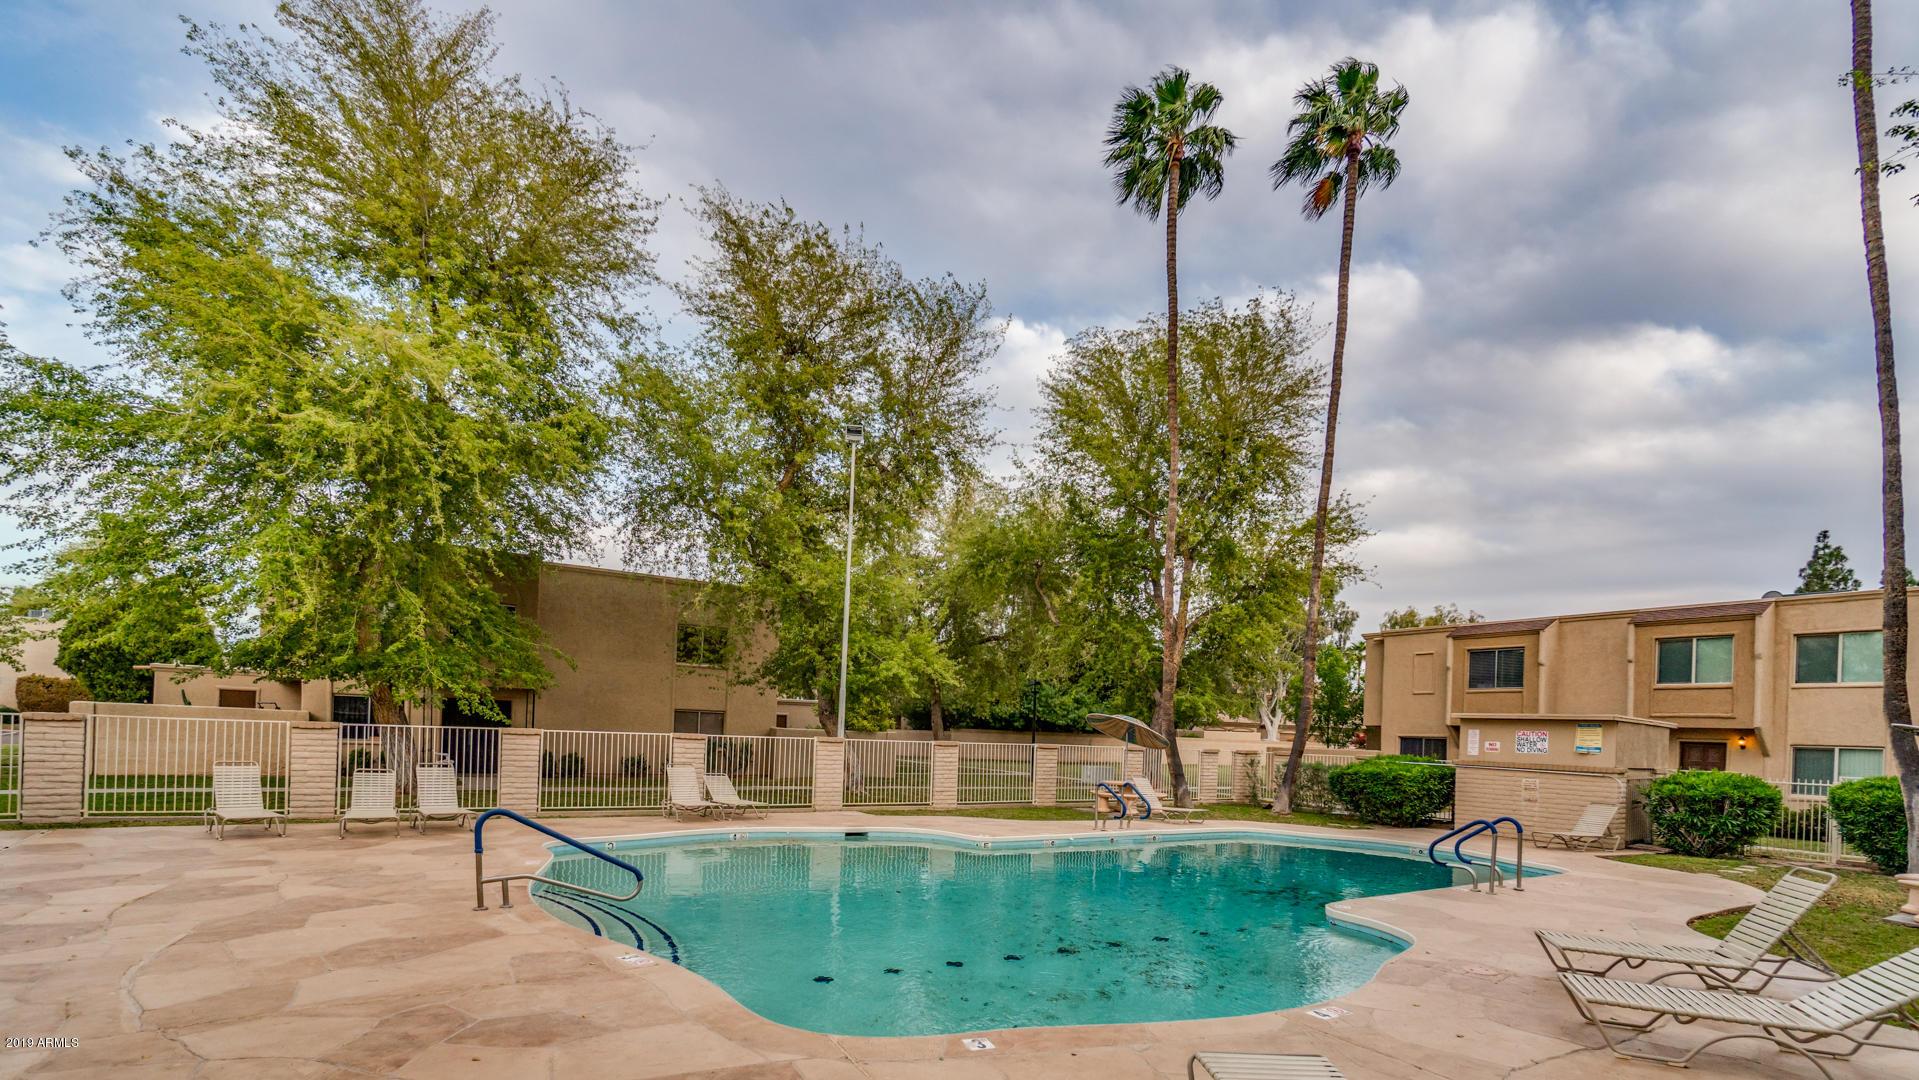 8065 E GLENROSA Avenue, Scottsdale, AZ 85251 (MLS# 5912471